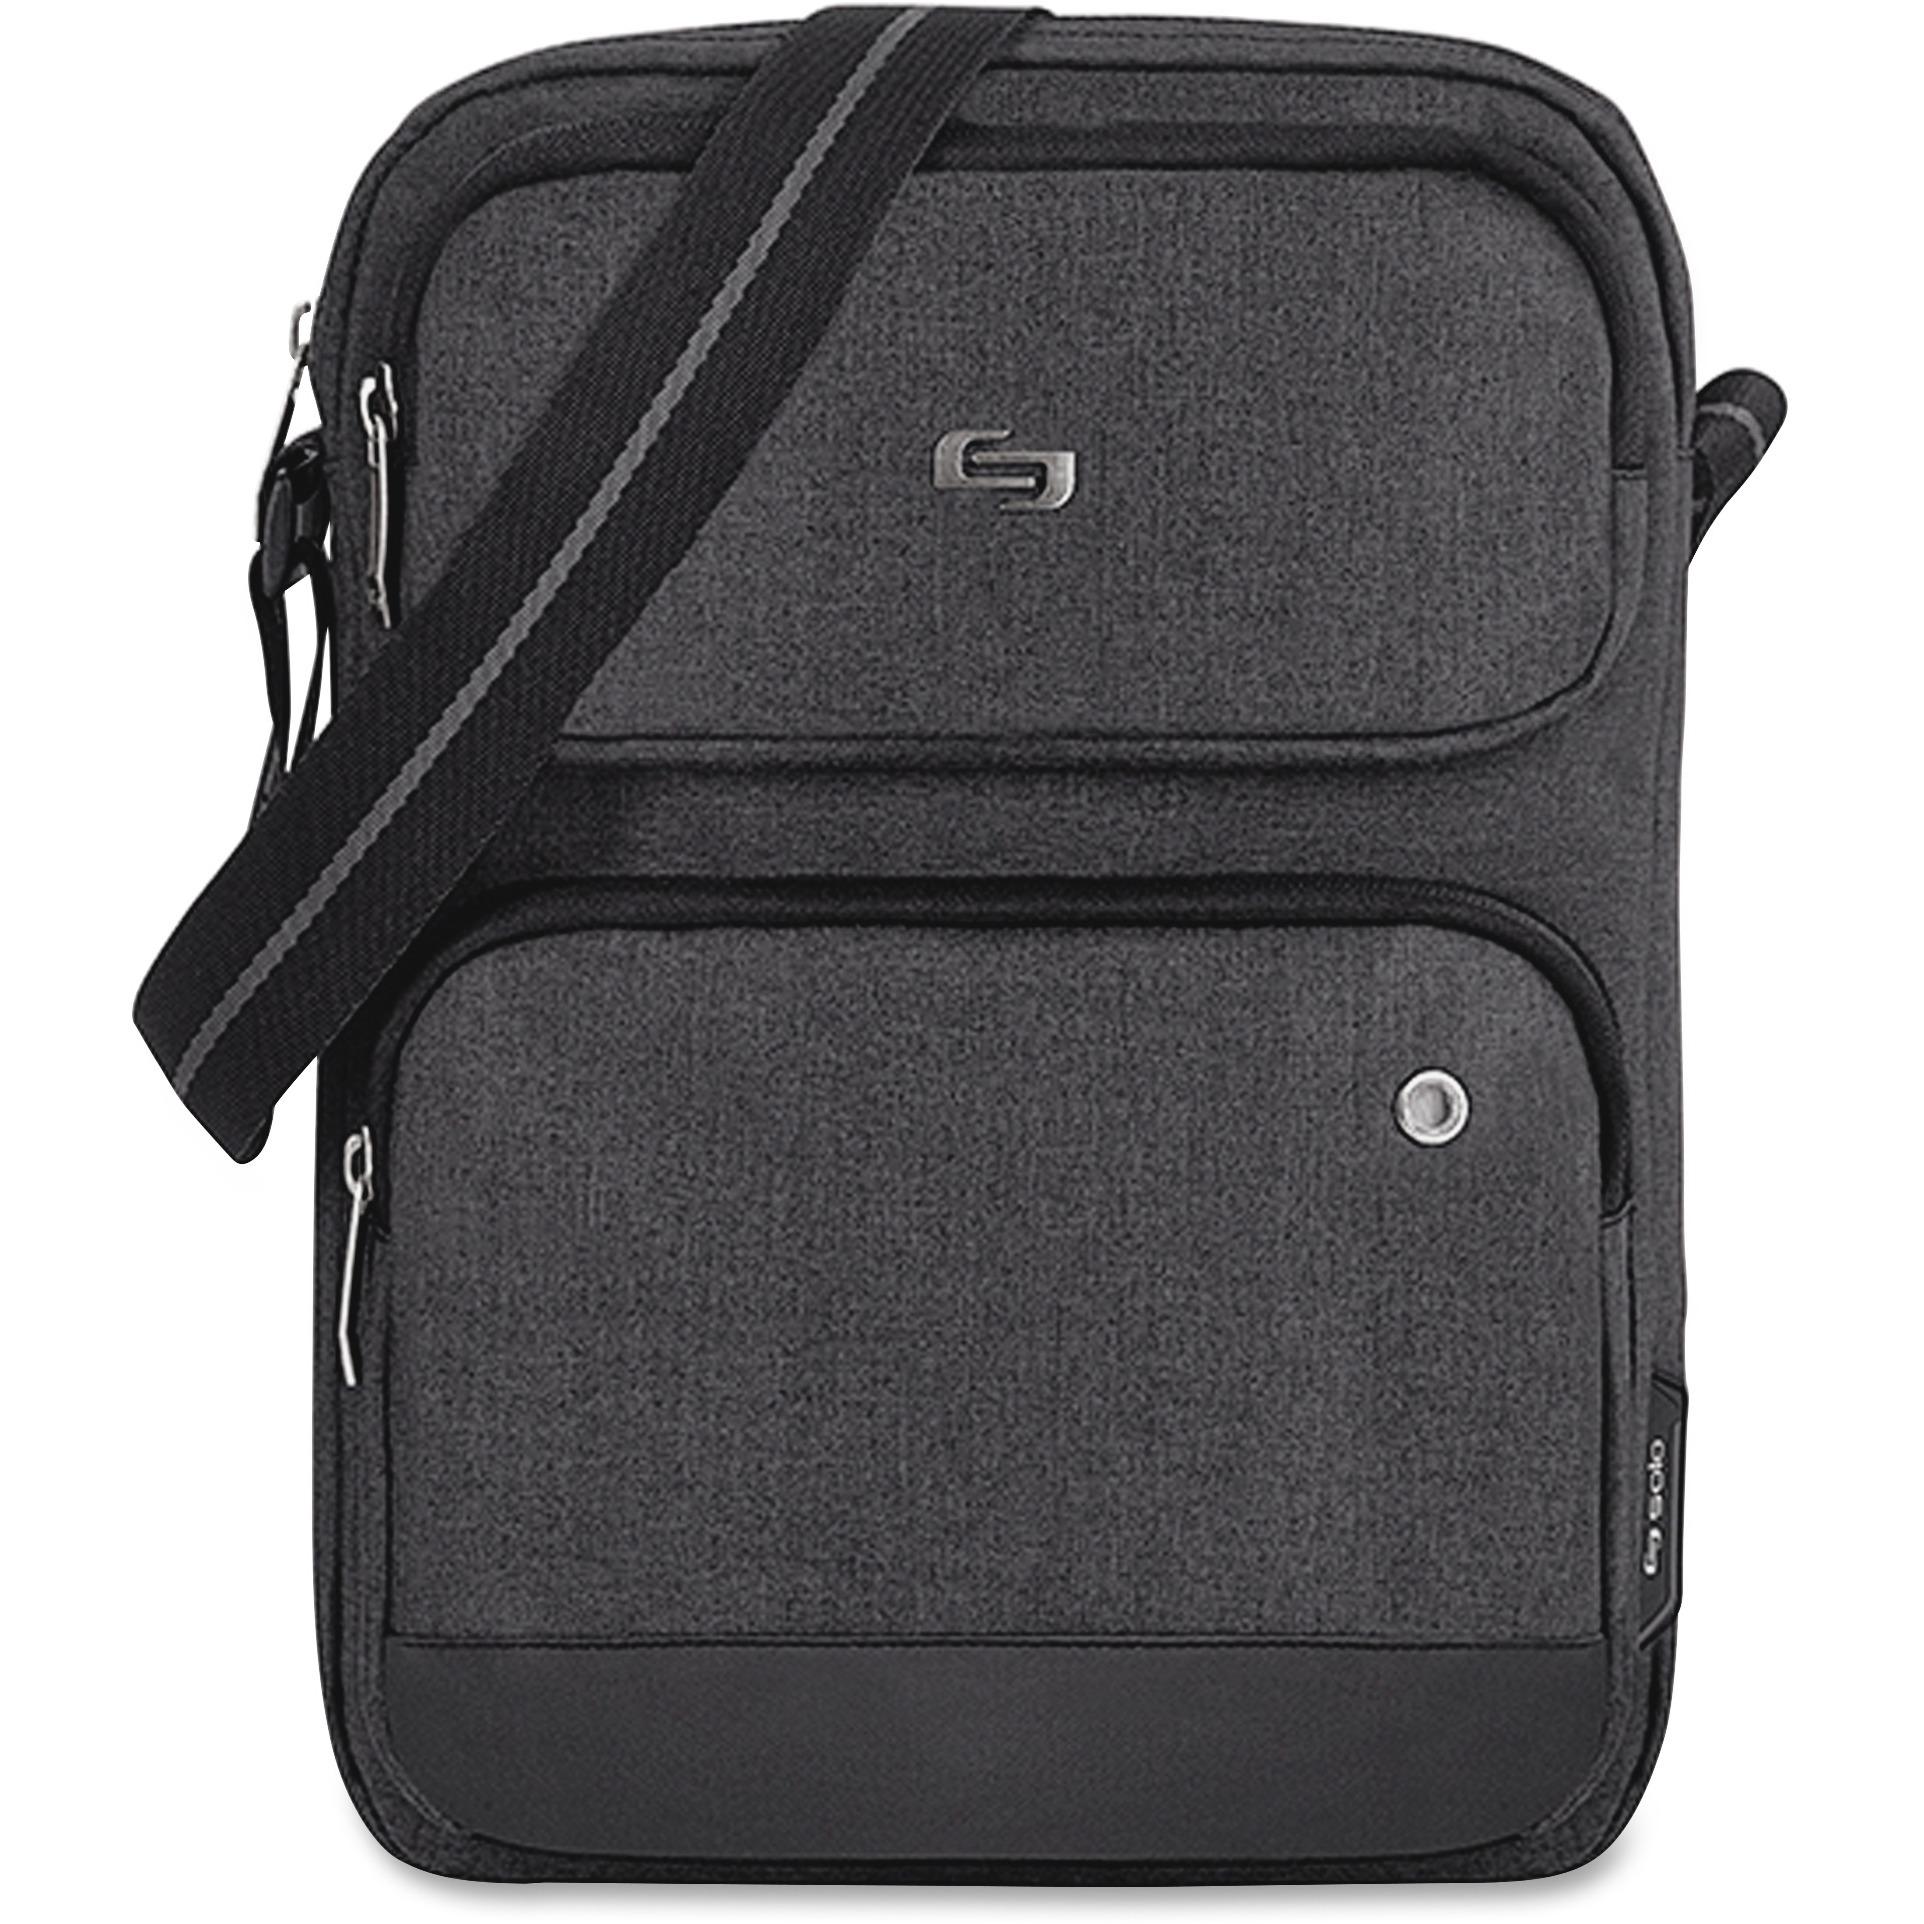 Solo, USLUBN21010, US Luggage Urban Universal Tablet Sling, 1, Gray